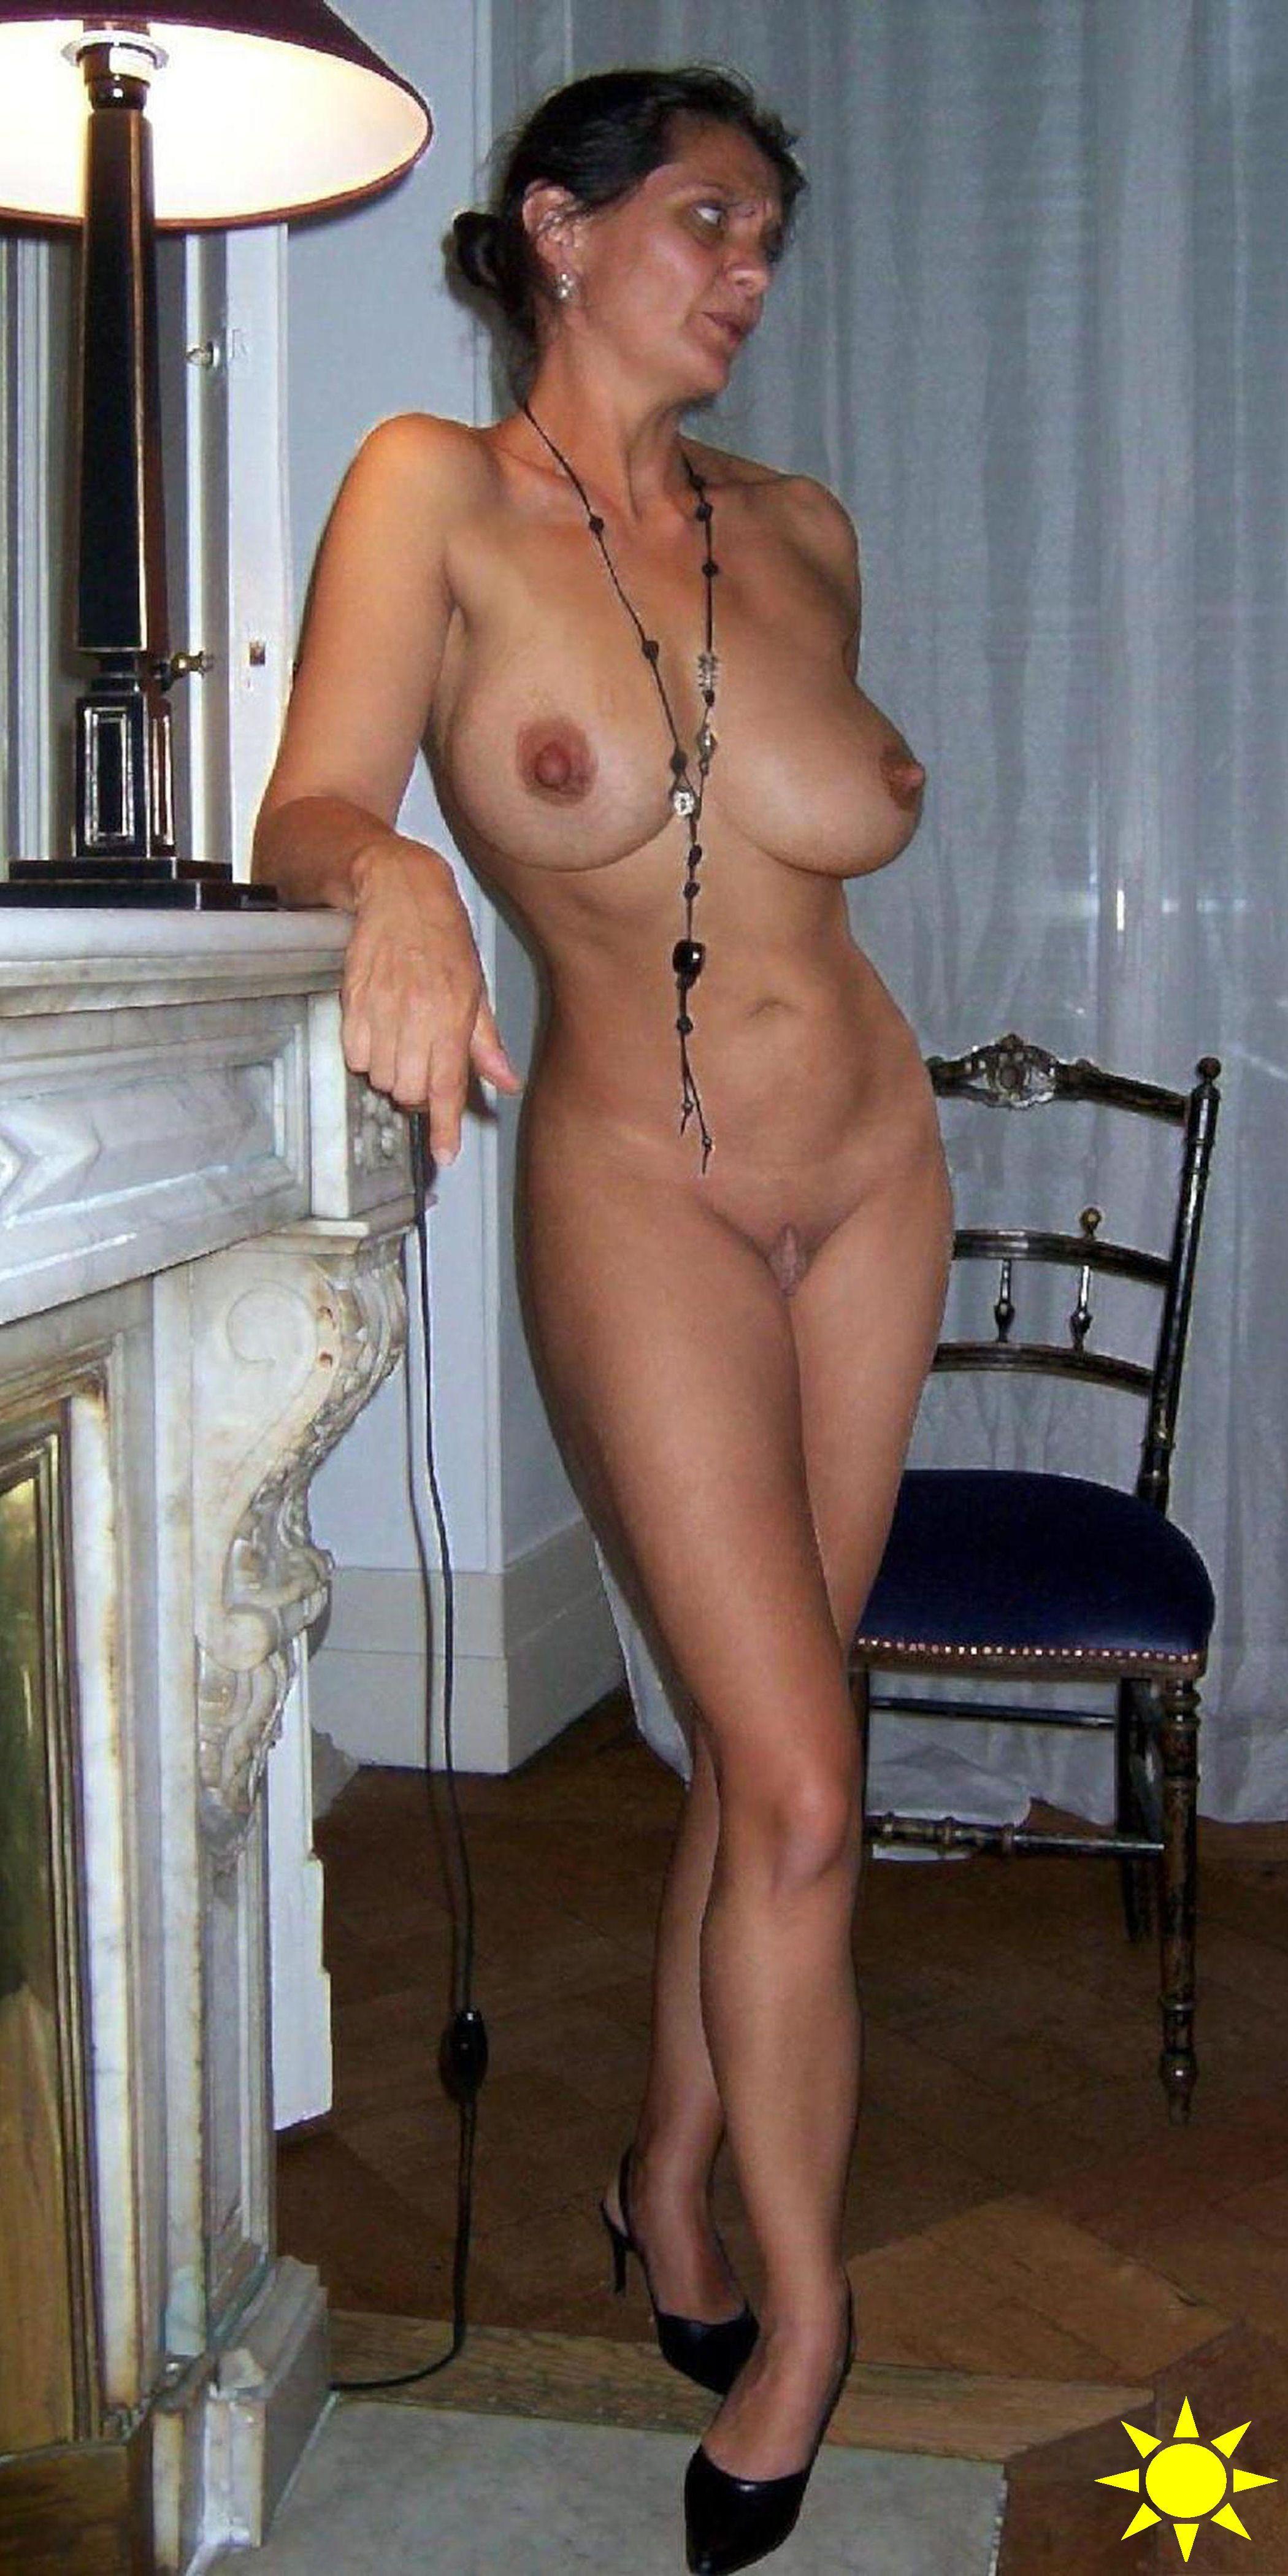 Nude letter opener